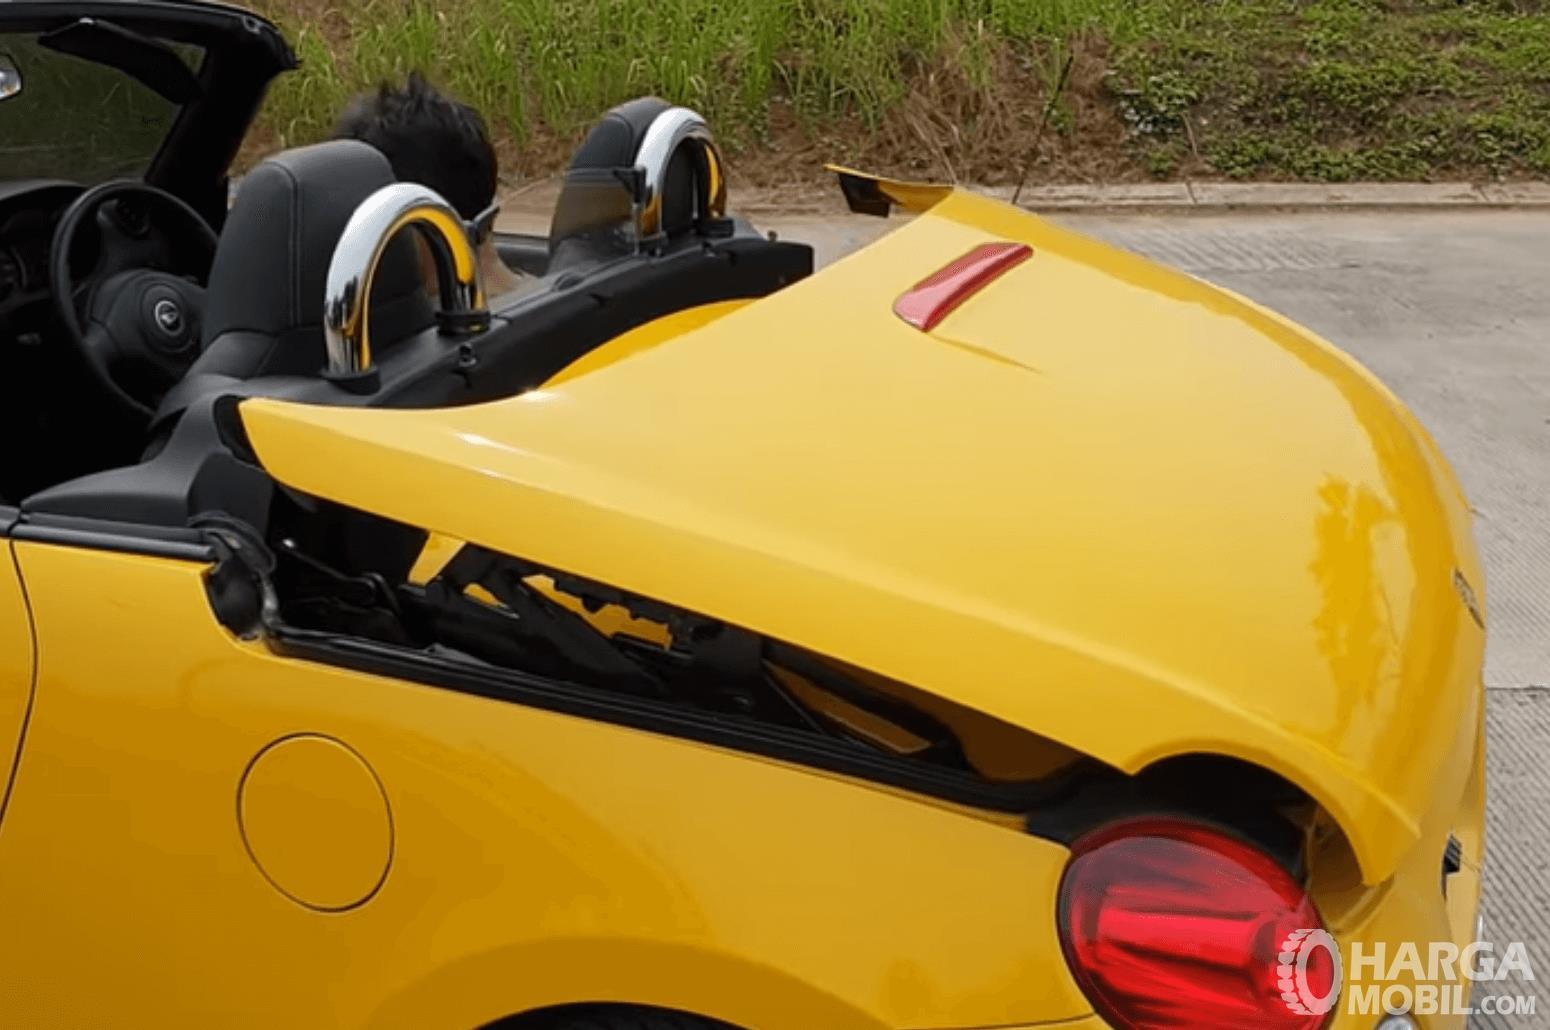 Gambar ini menunjukkan mobil  Daihatsu Copen 2003 dengan kap belakang akan membuka